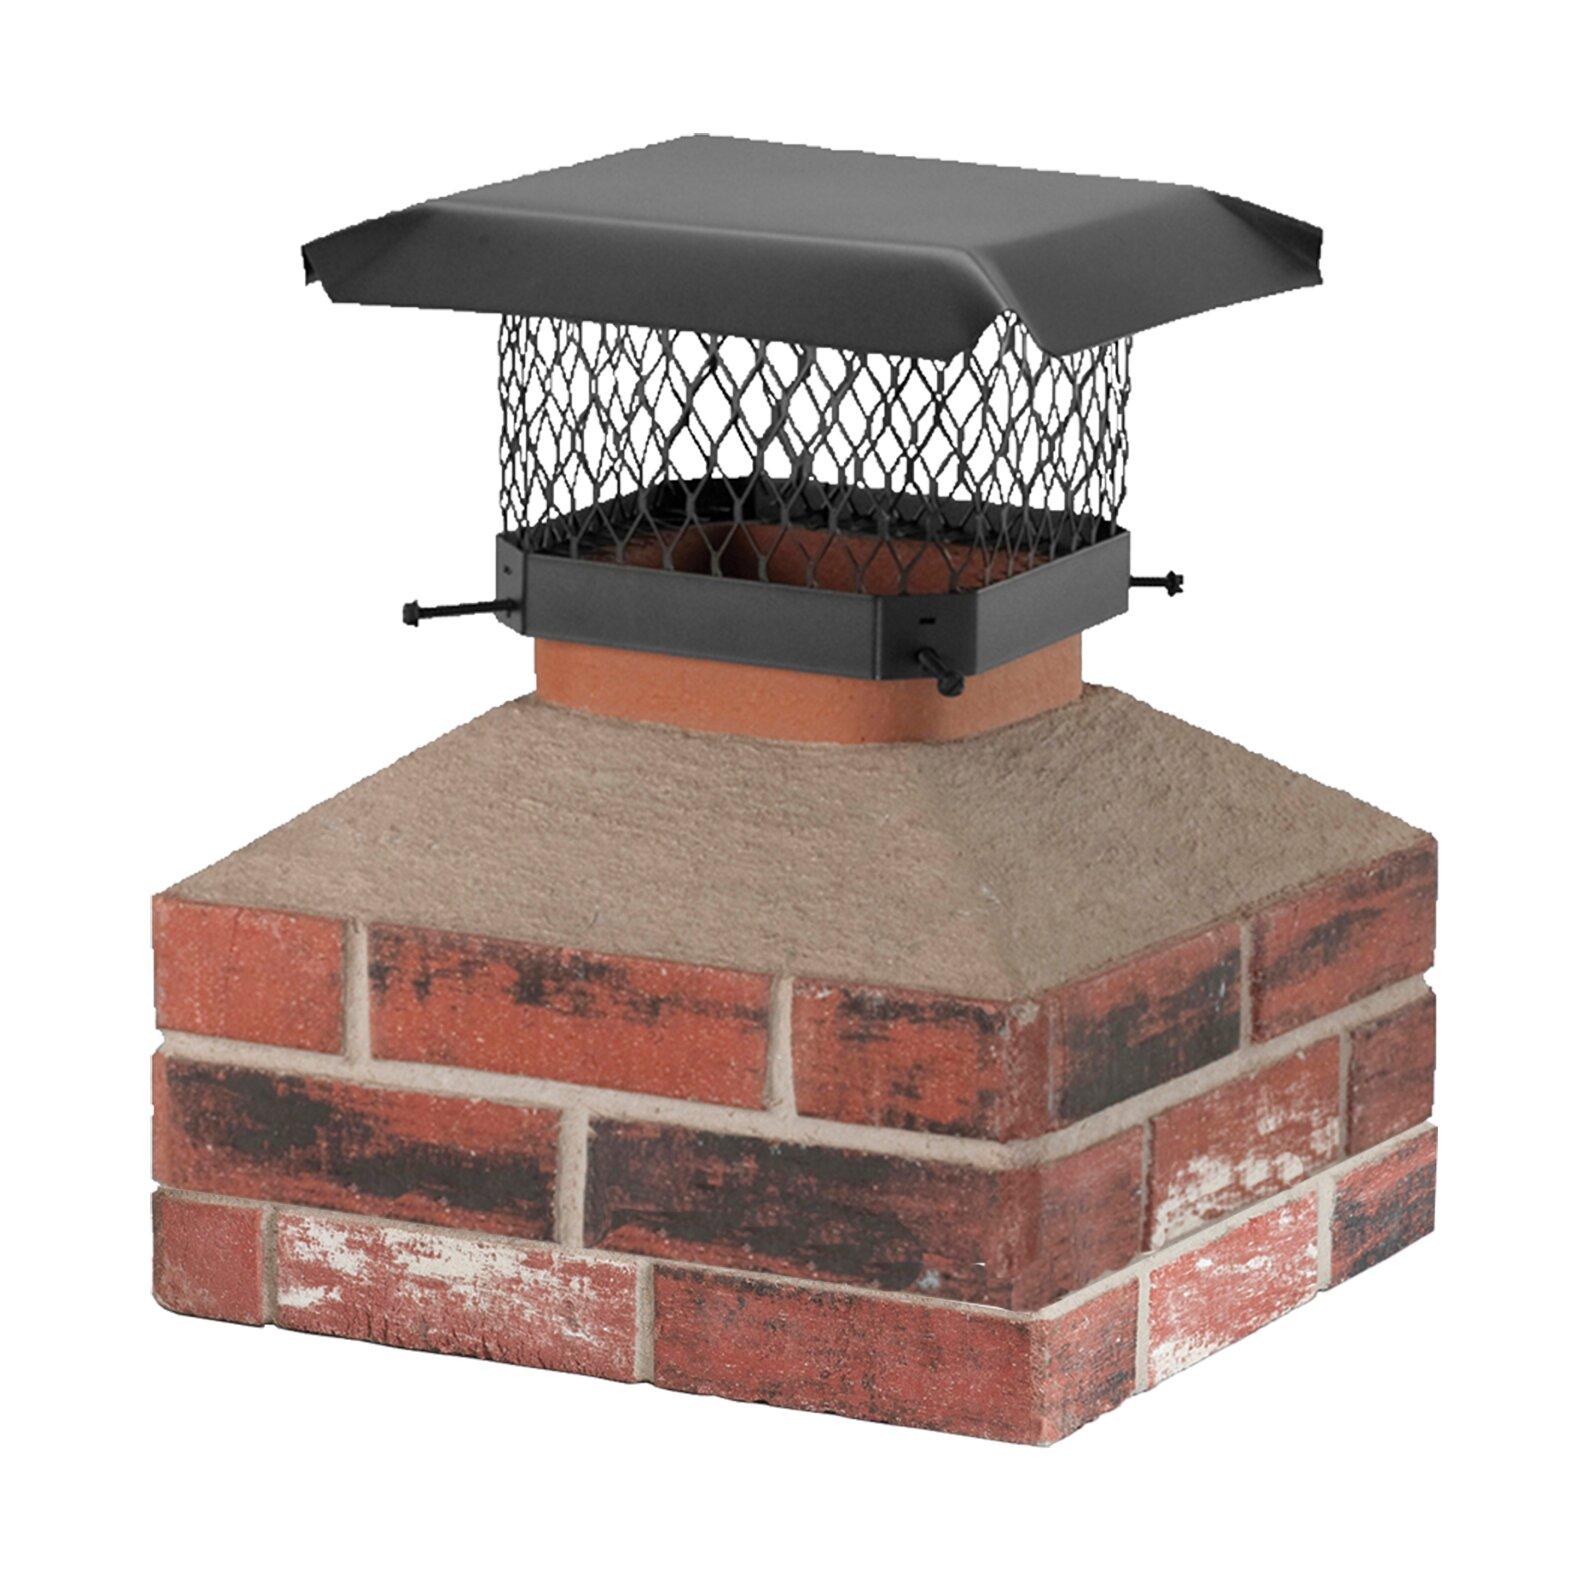 Shelter Shelter Galvanized Steel Chimney Cap Wayfair